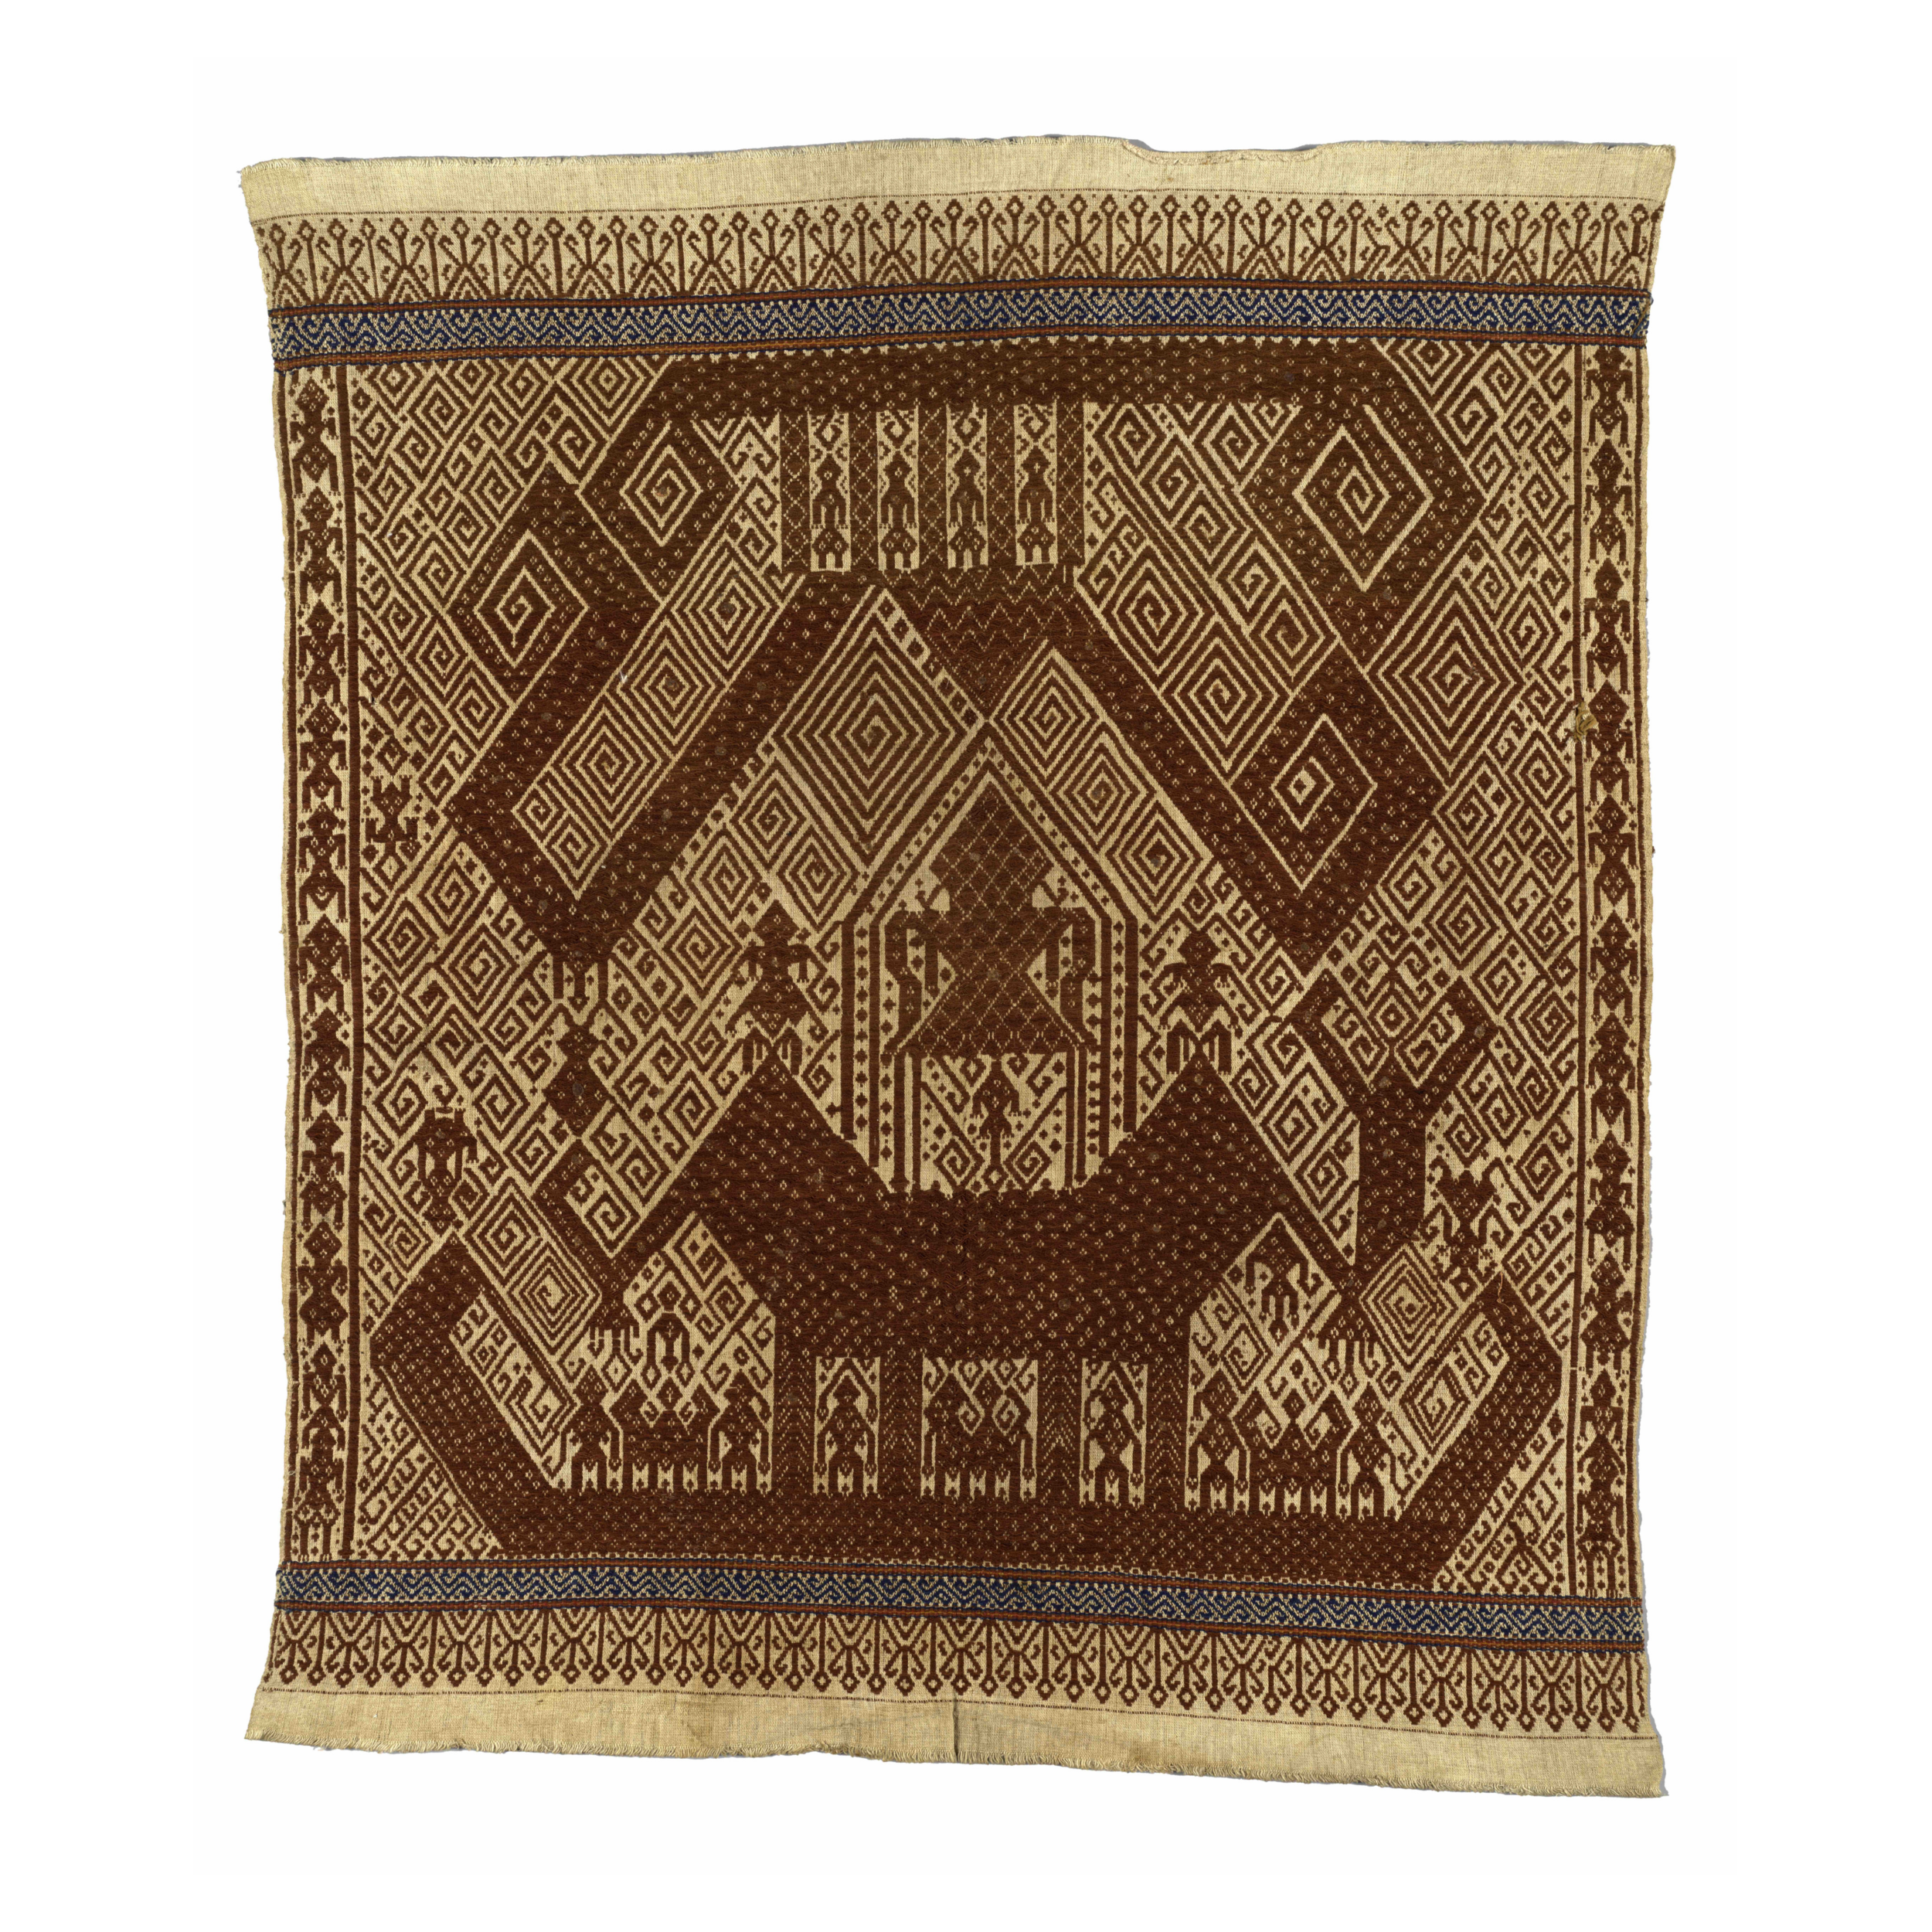 Tampan    Ceremonial Textile   Lampung, South Sumatra   Gift of Ernest Erickson Foundation   1988.104.28 © The Metropolitan Museum of Art   New York, USA